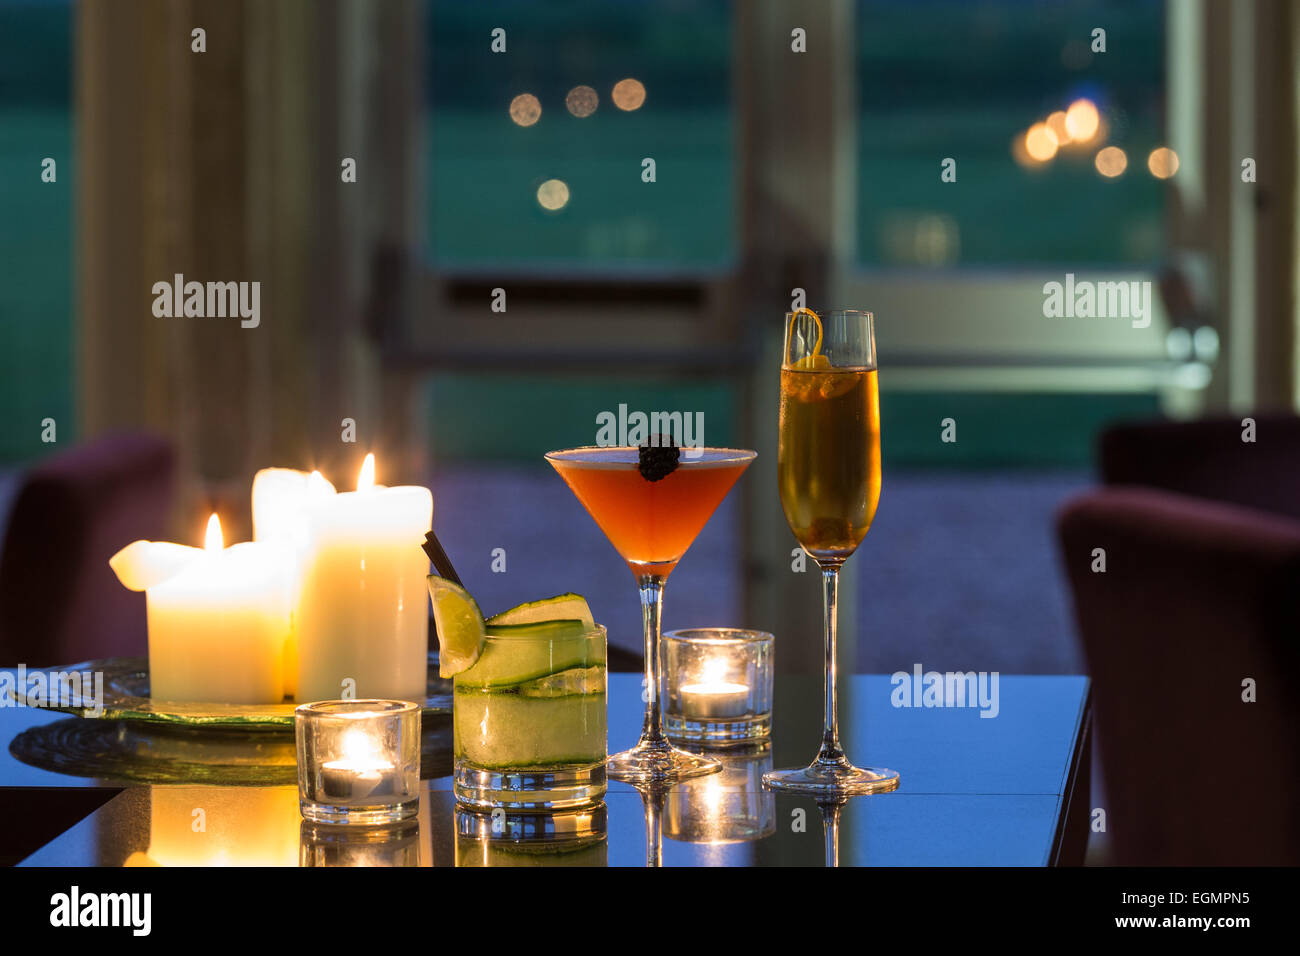 Cocktails on a bar at dusk - Stock Image